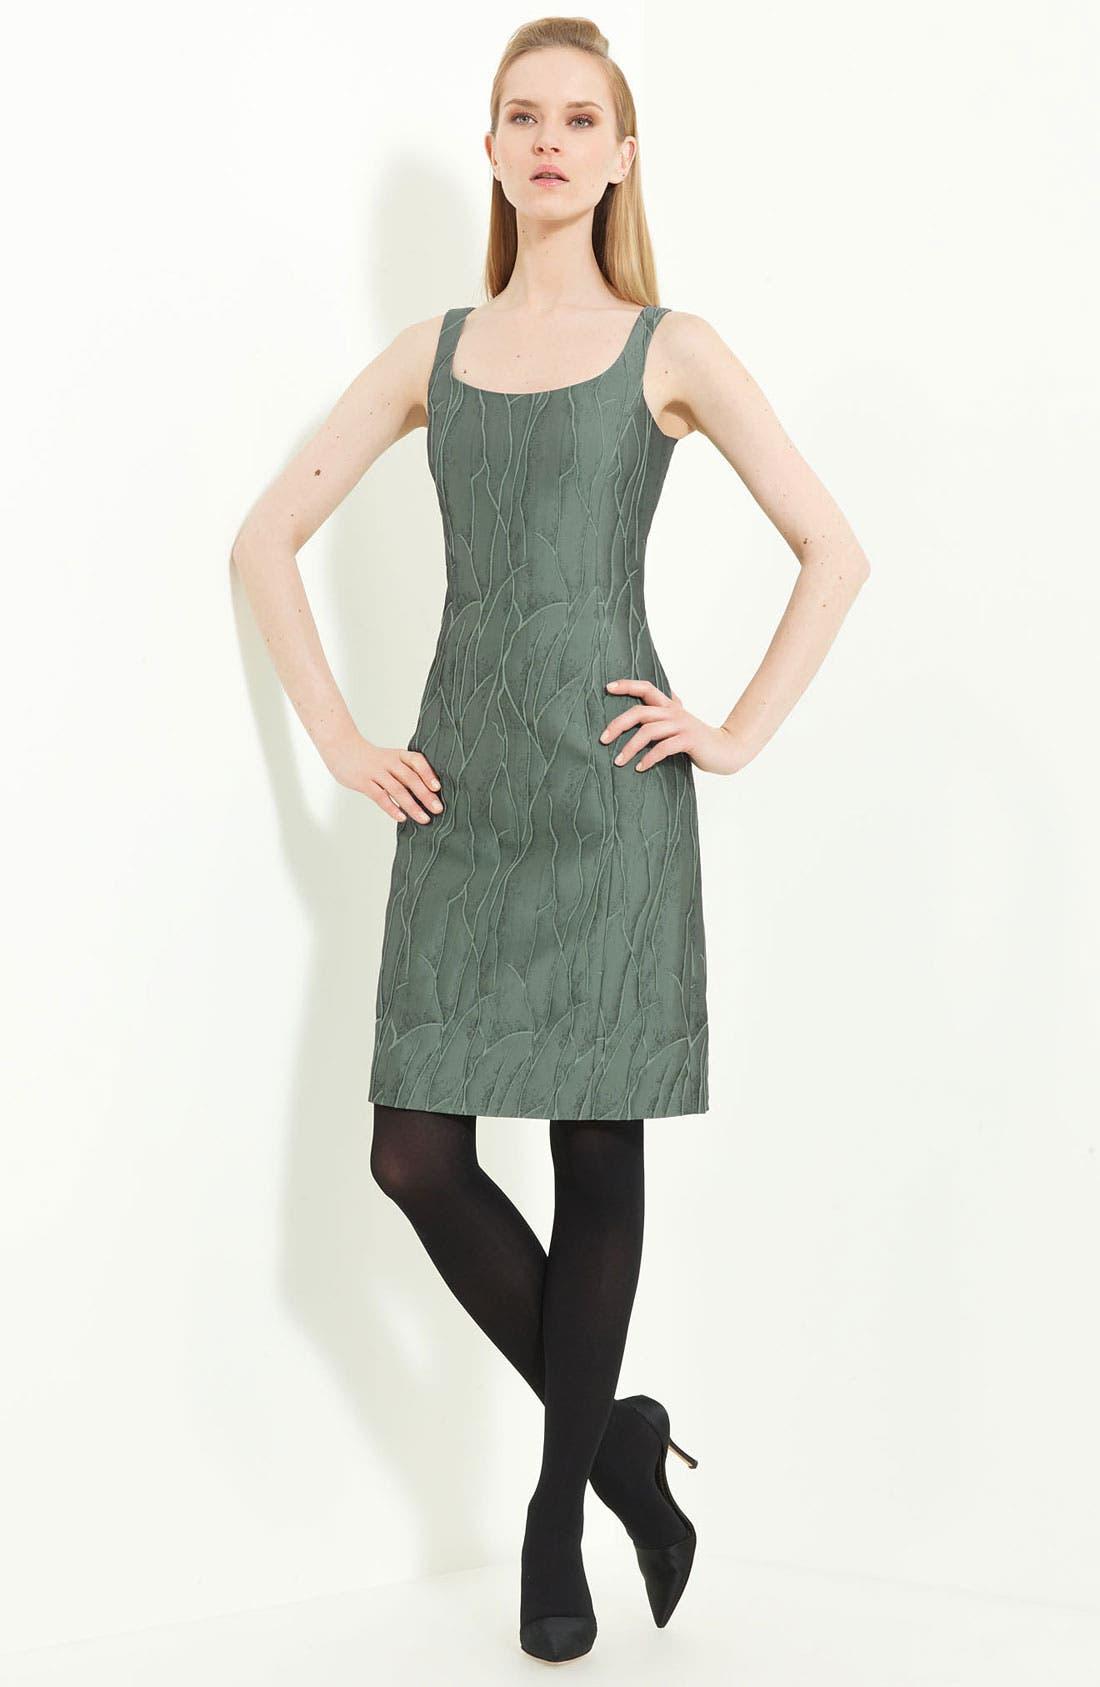 Alternate Image 1 Selected - Armani Collezioni Jacquard Sheath Dress